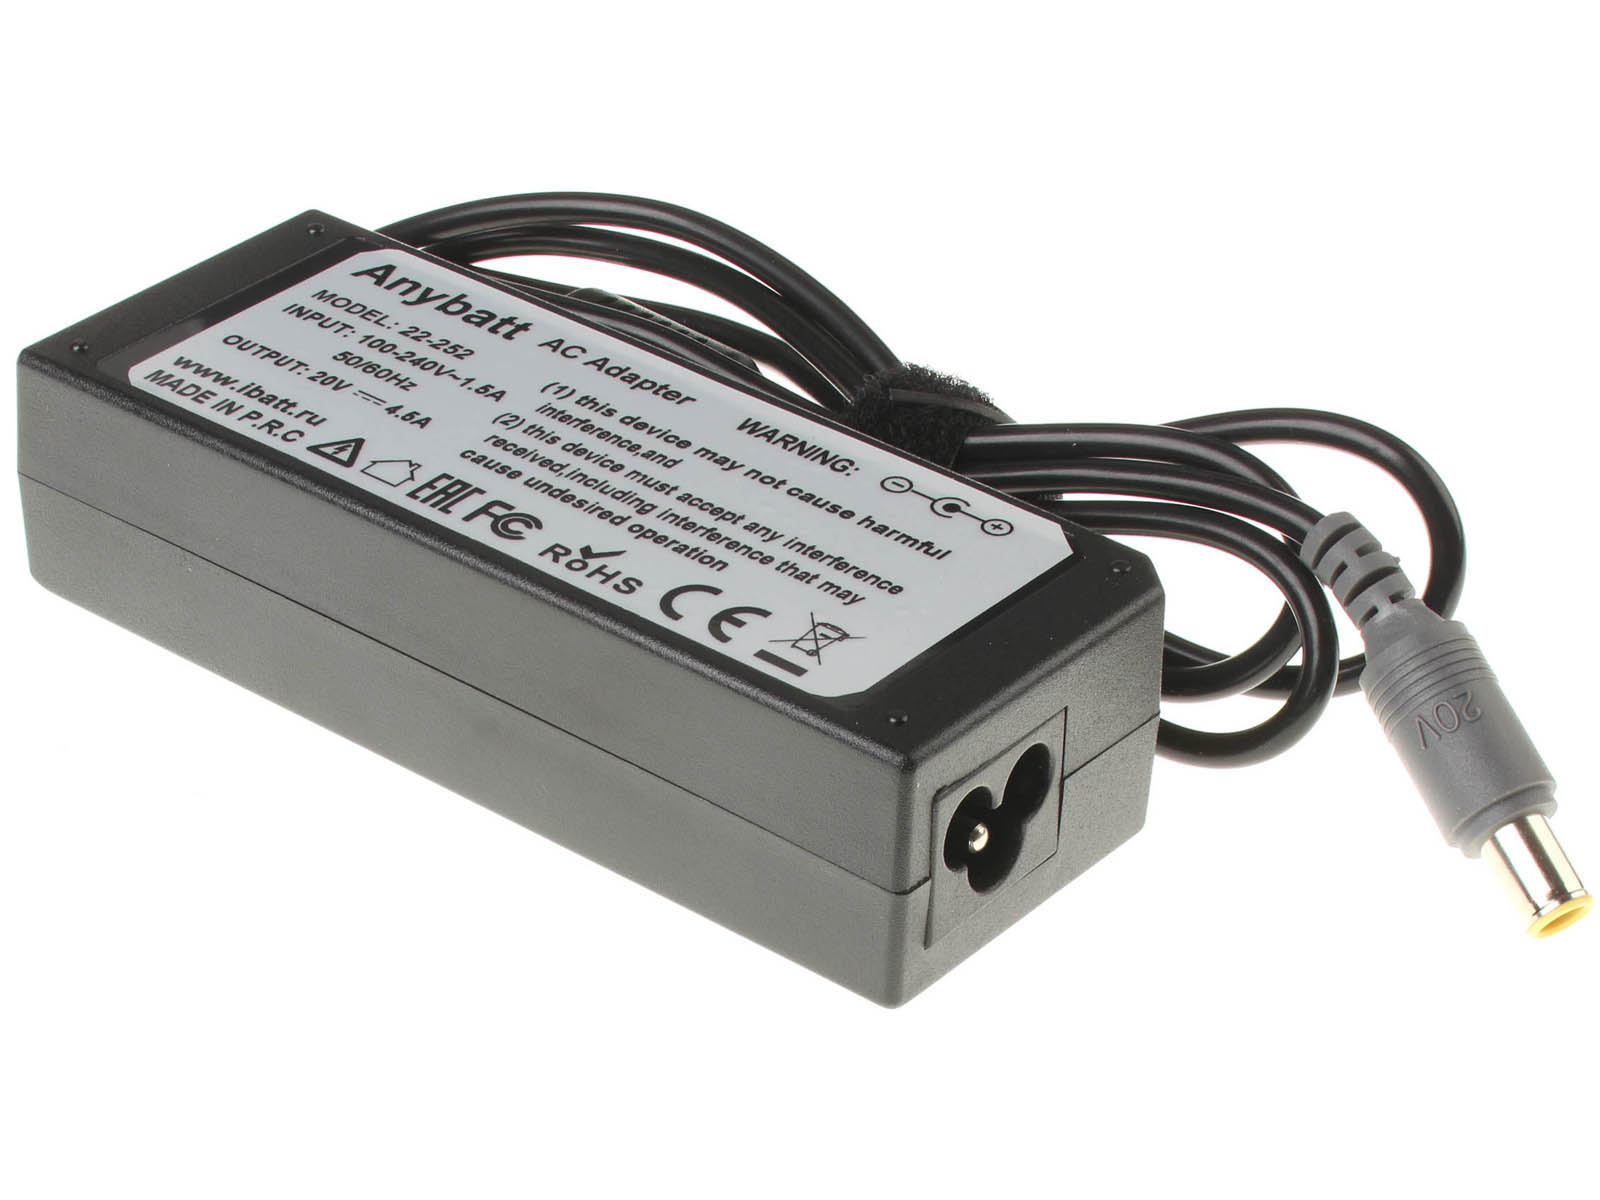 Блок питания (адаптер питания) для ноутбука IBM-Lenovo ThinkPad L520. Артикул 22-252. Напряжение (V): 20